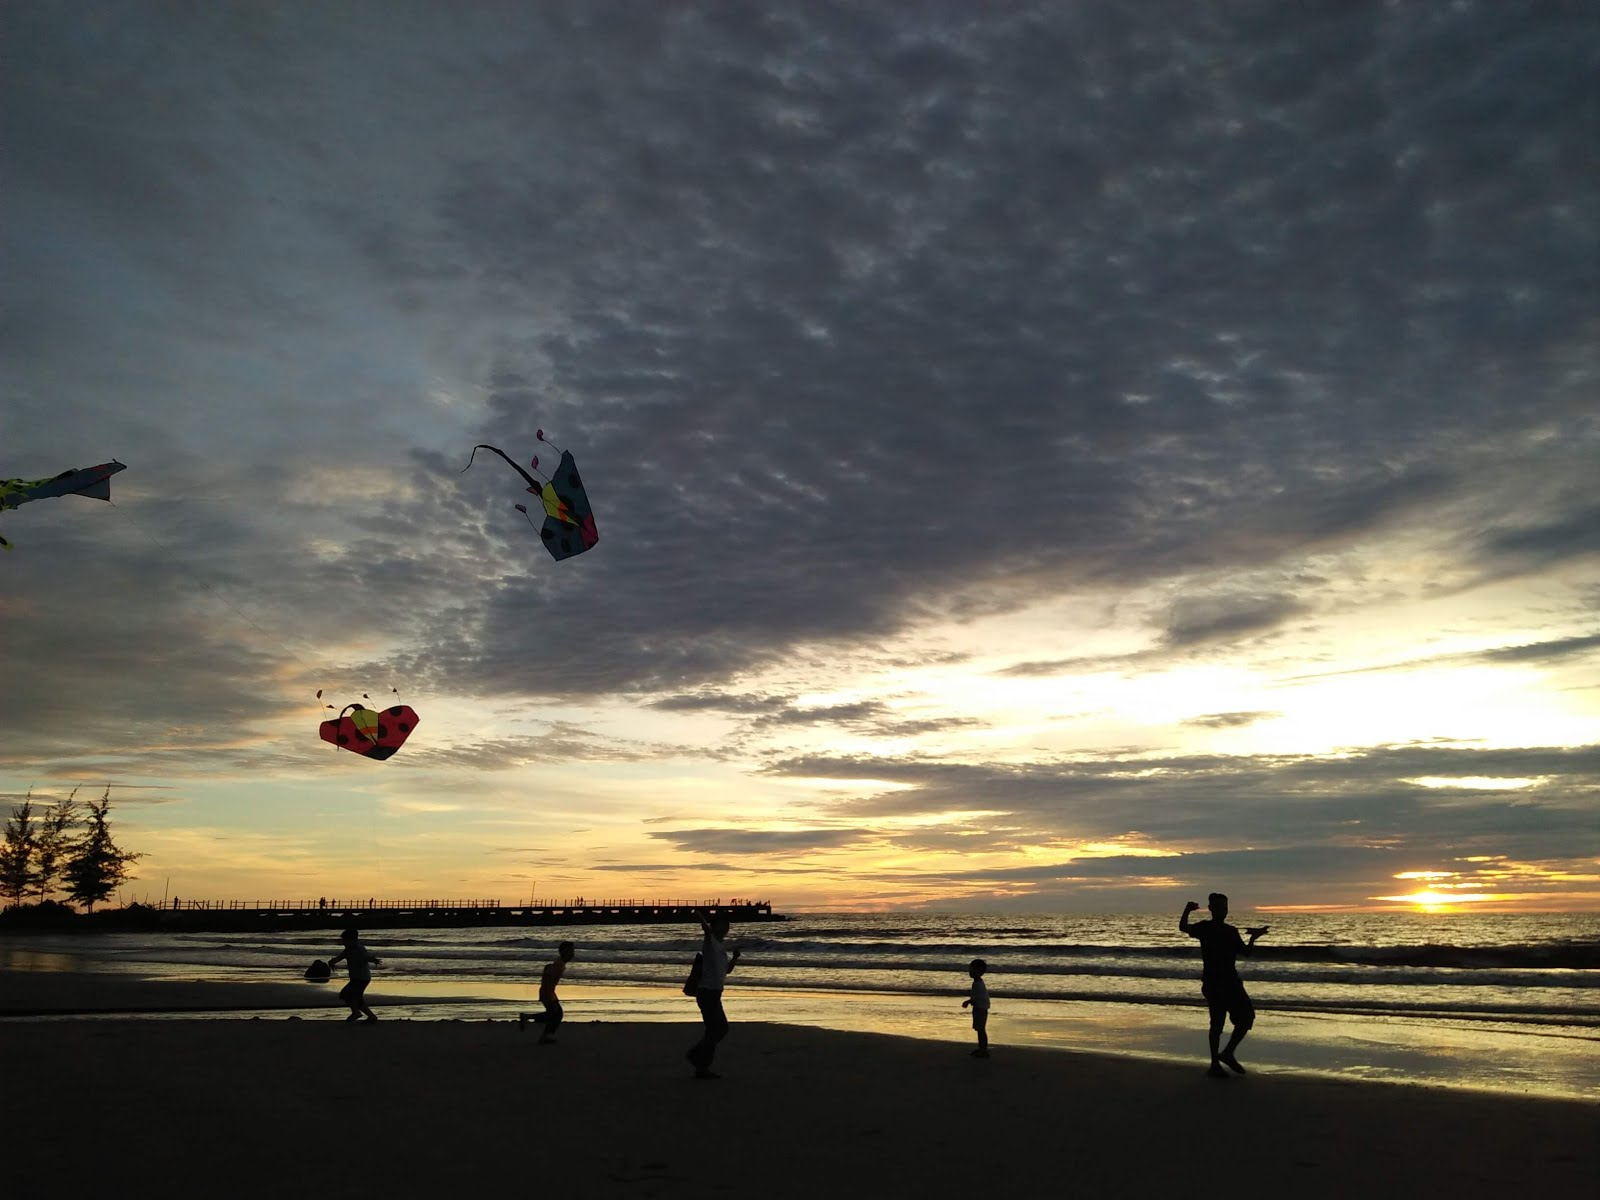 sunset, view, tanjung lobang